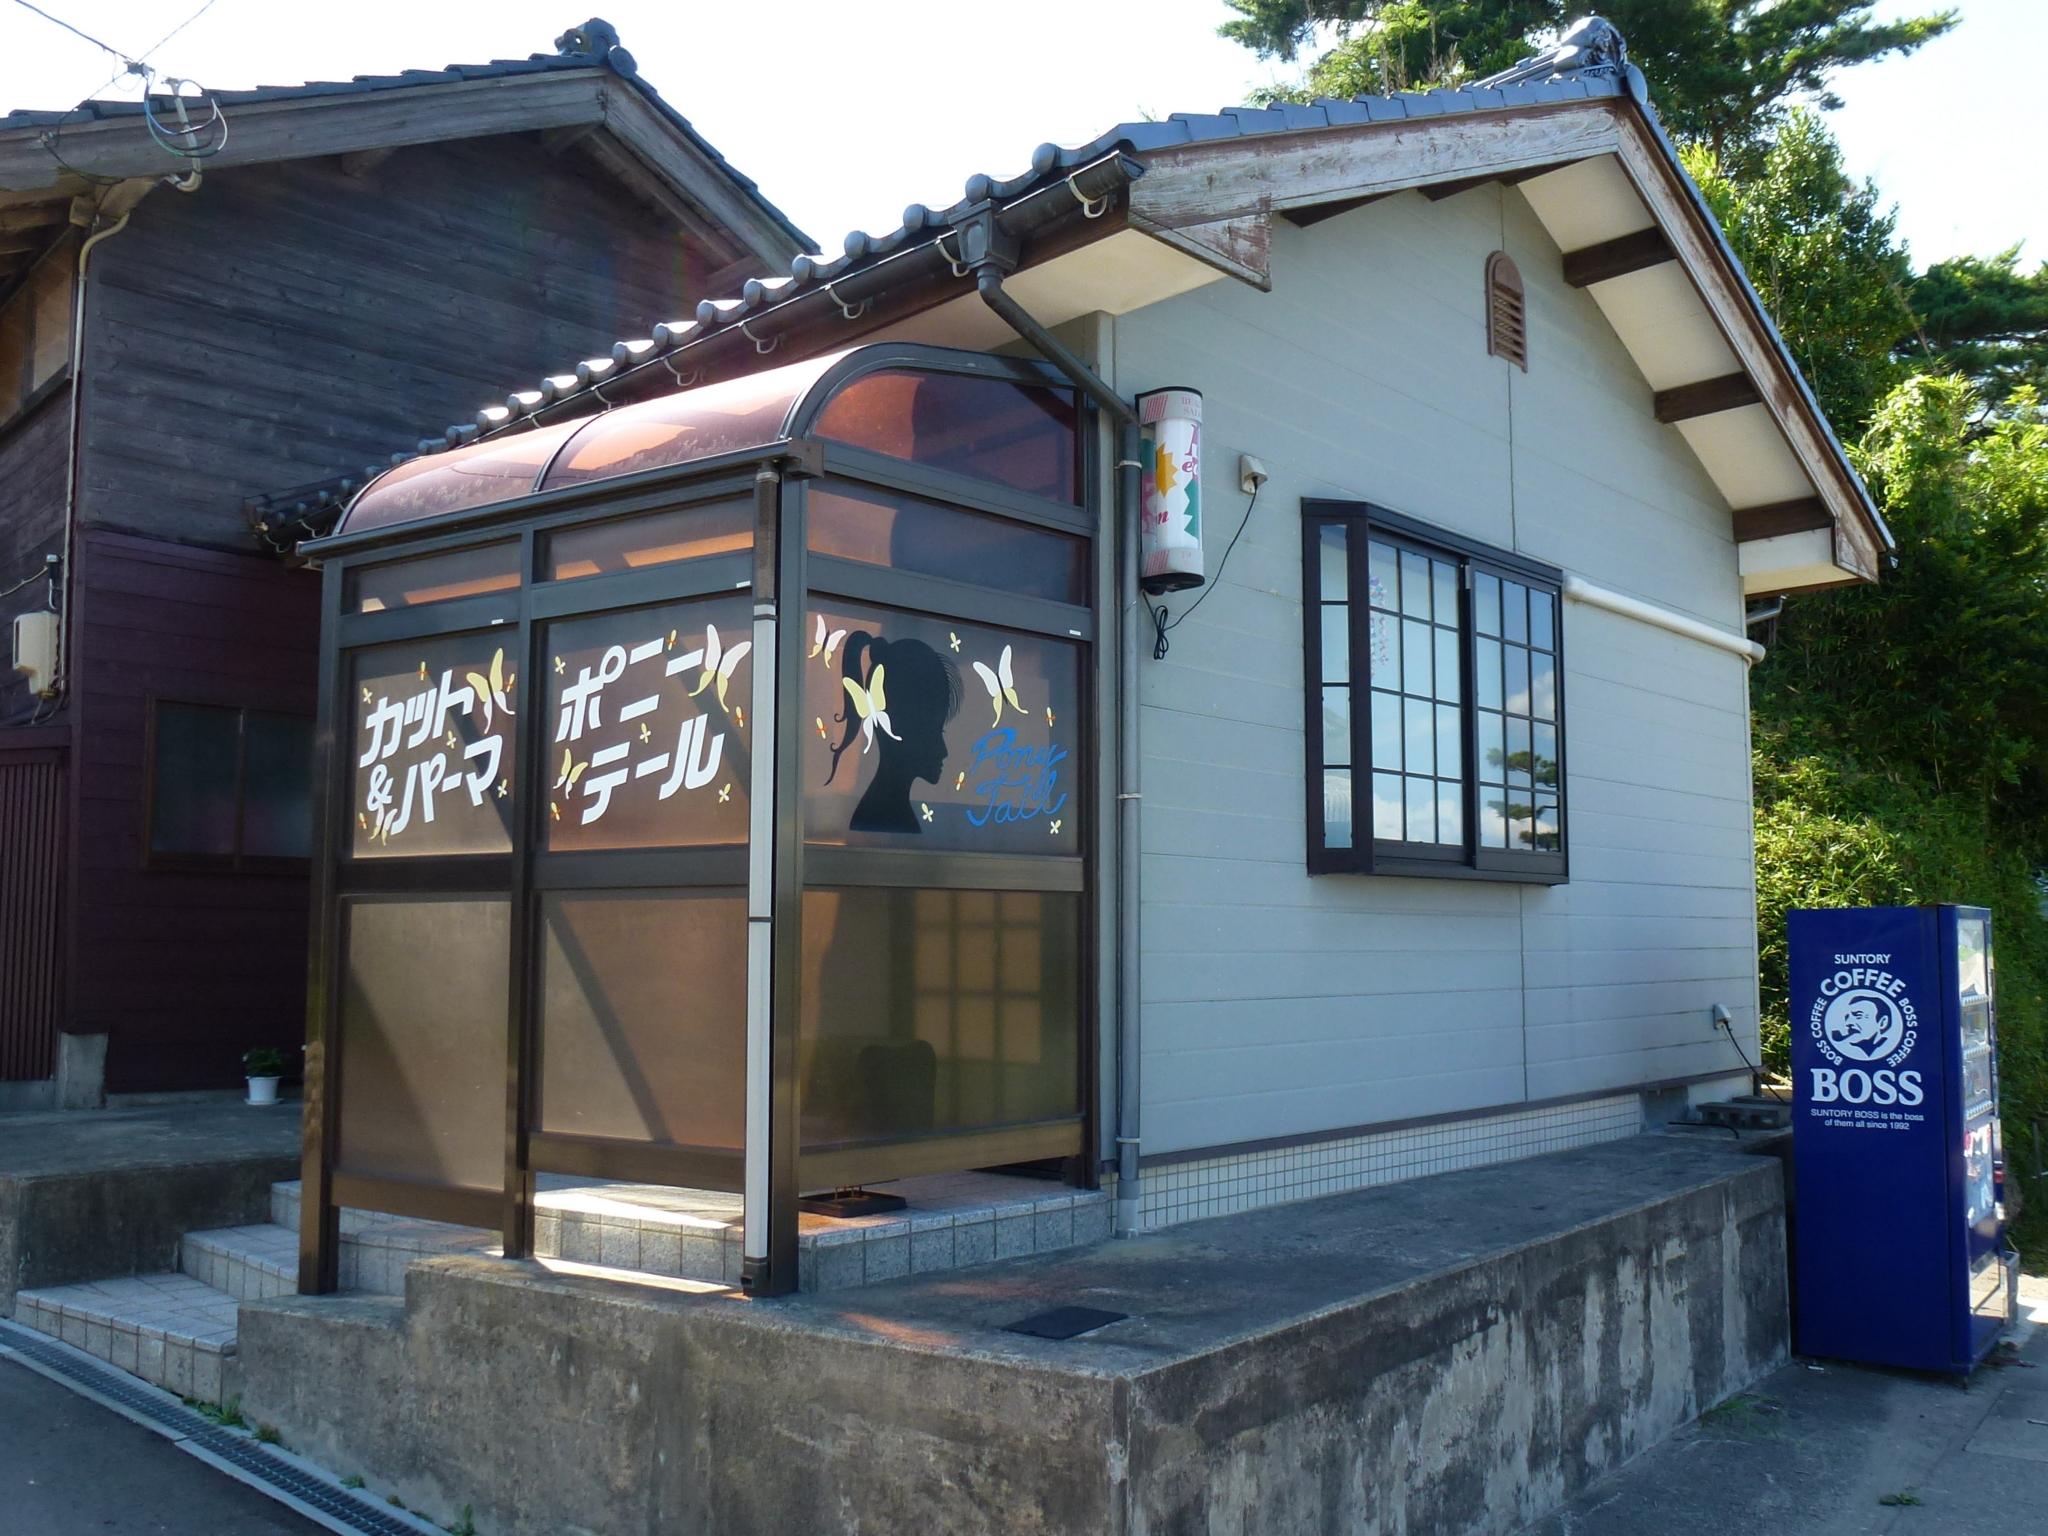 f:id:ToshUeno:20120819134909j:plain